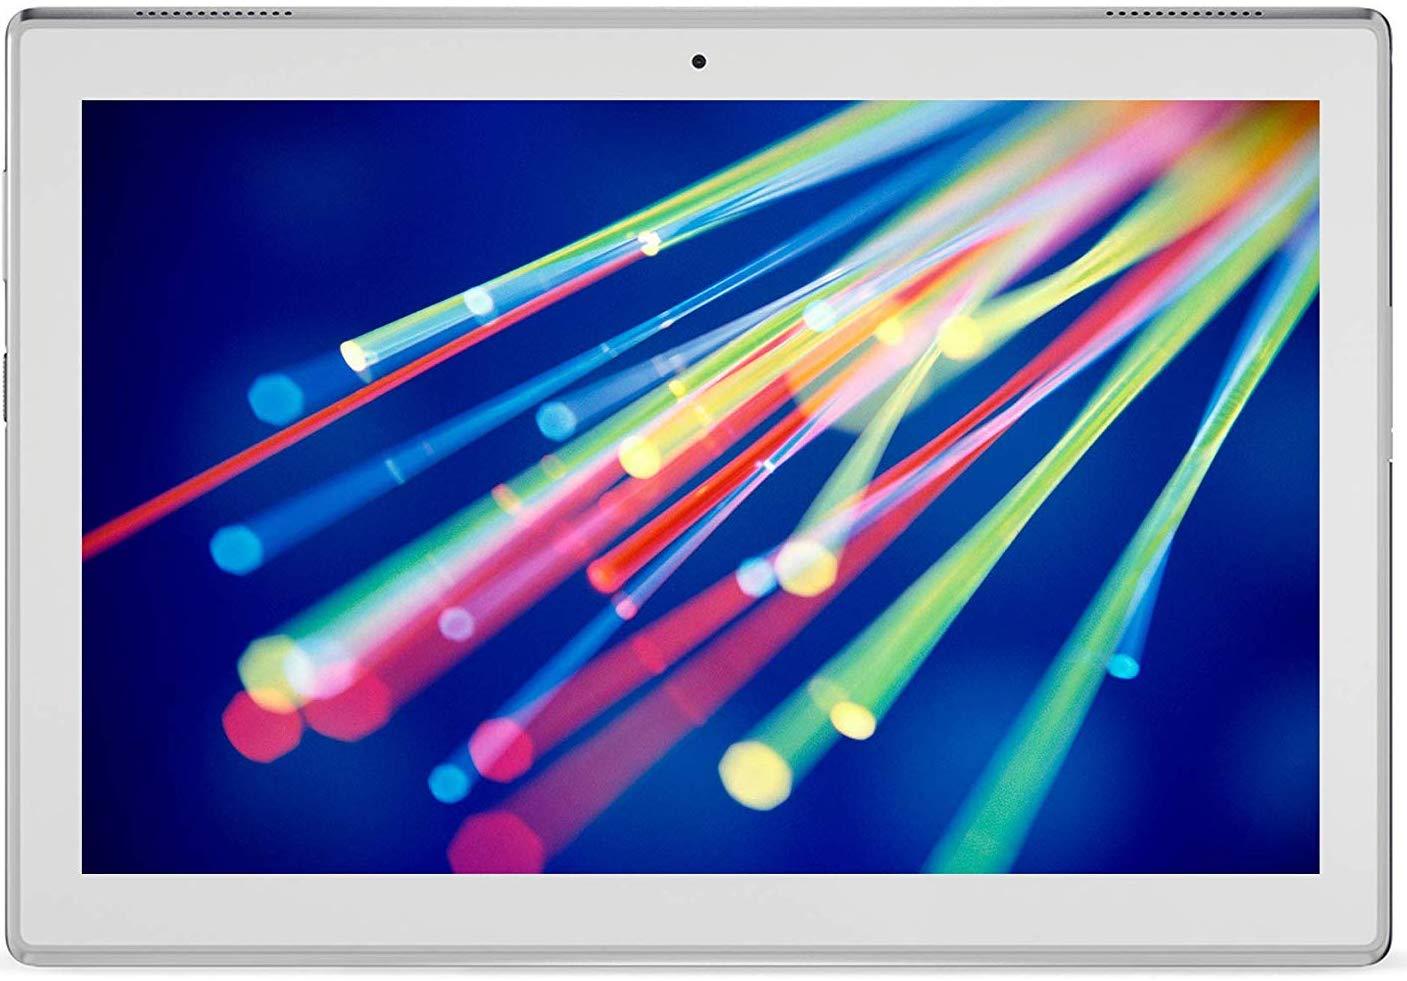 Offerta Lenovo Tab 4 10 LTE su TrovaUsati.it